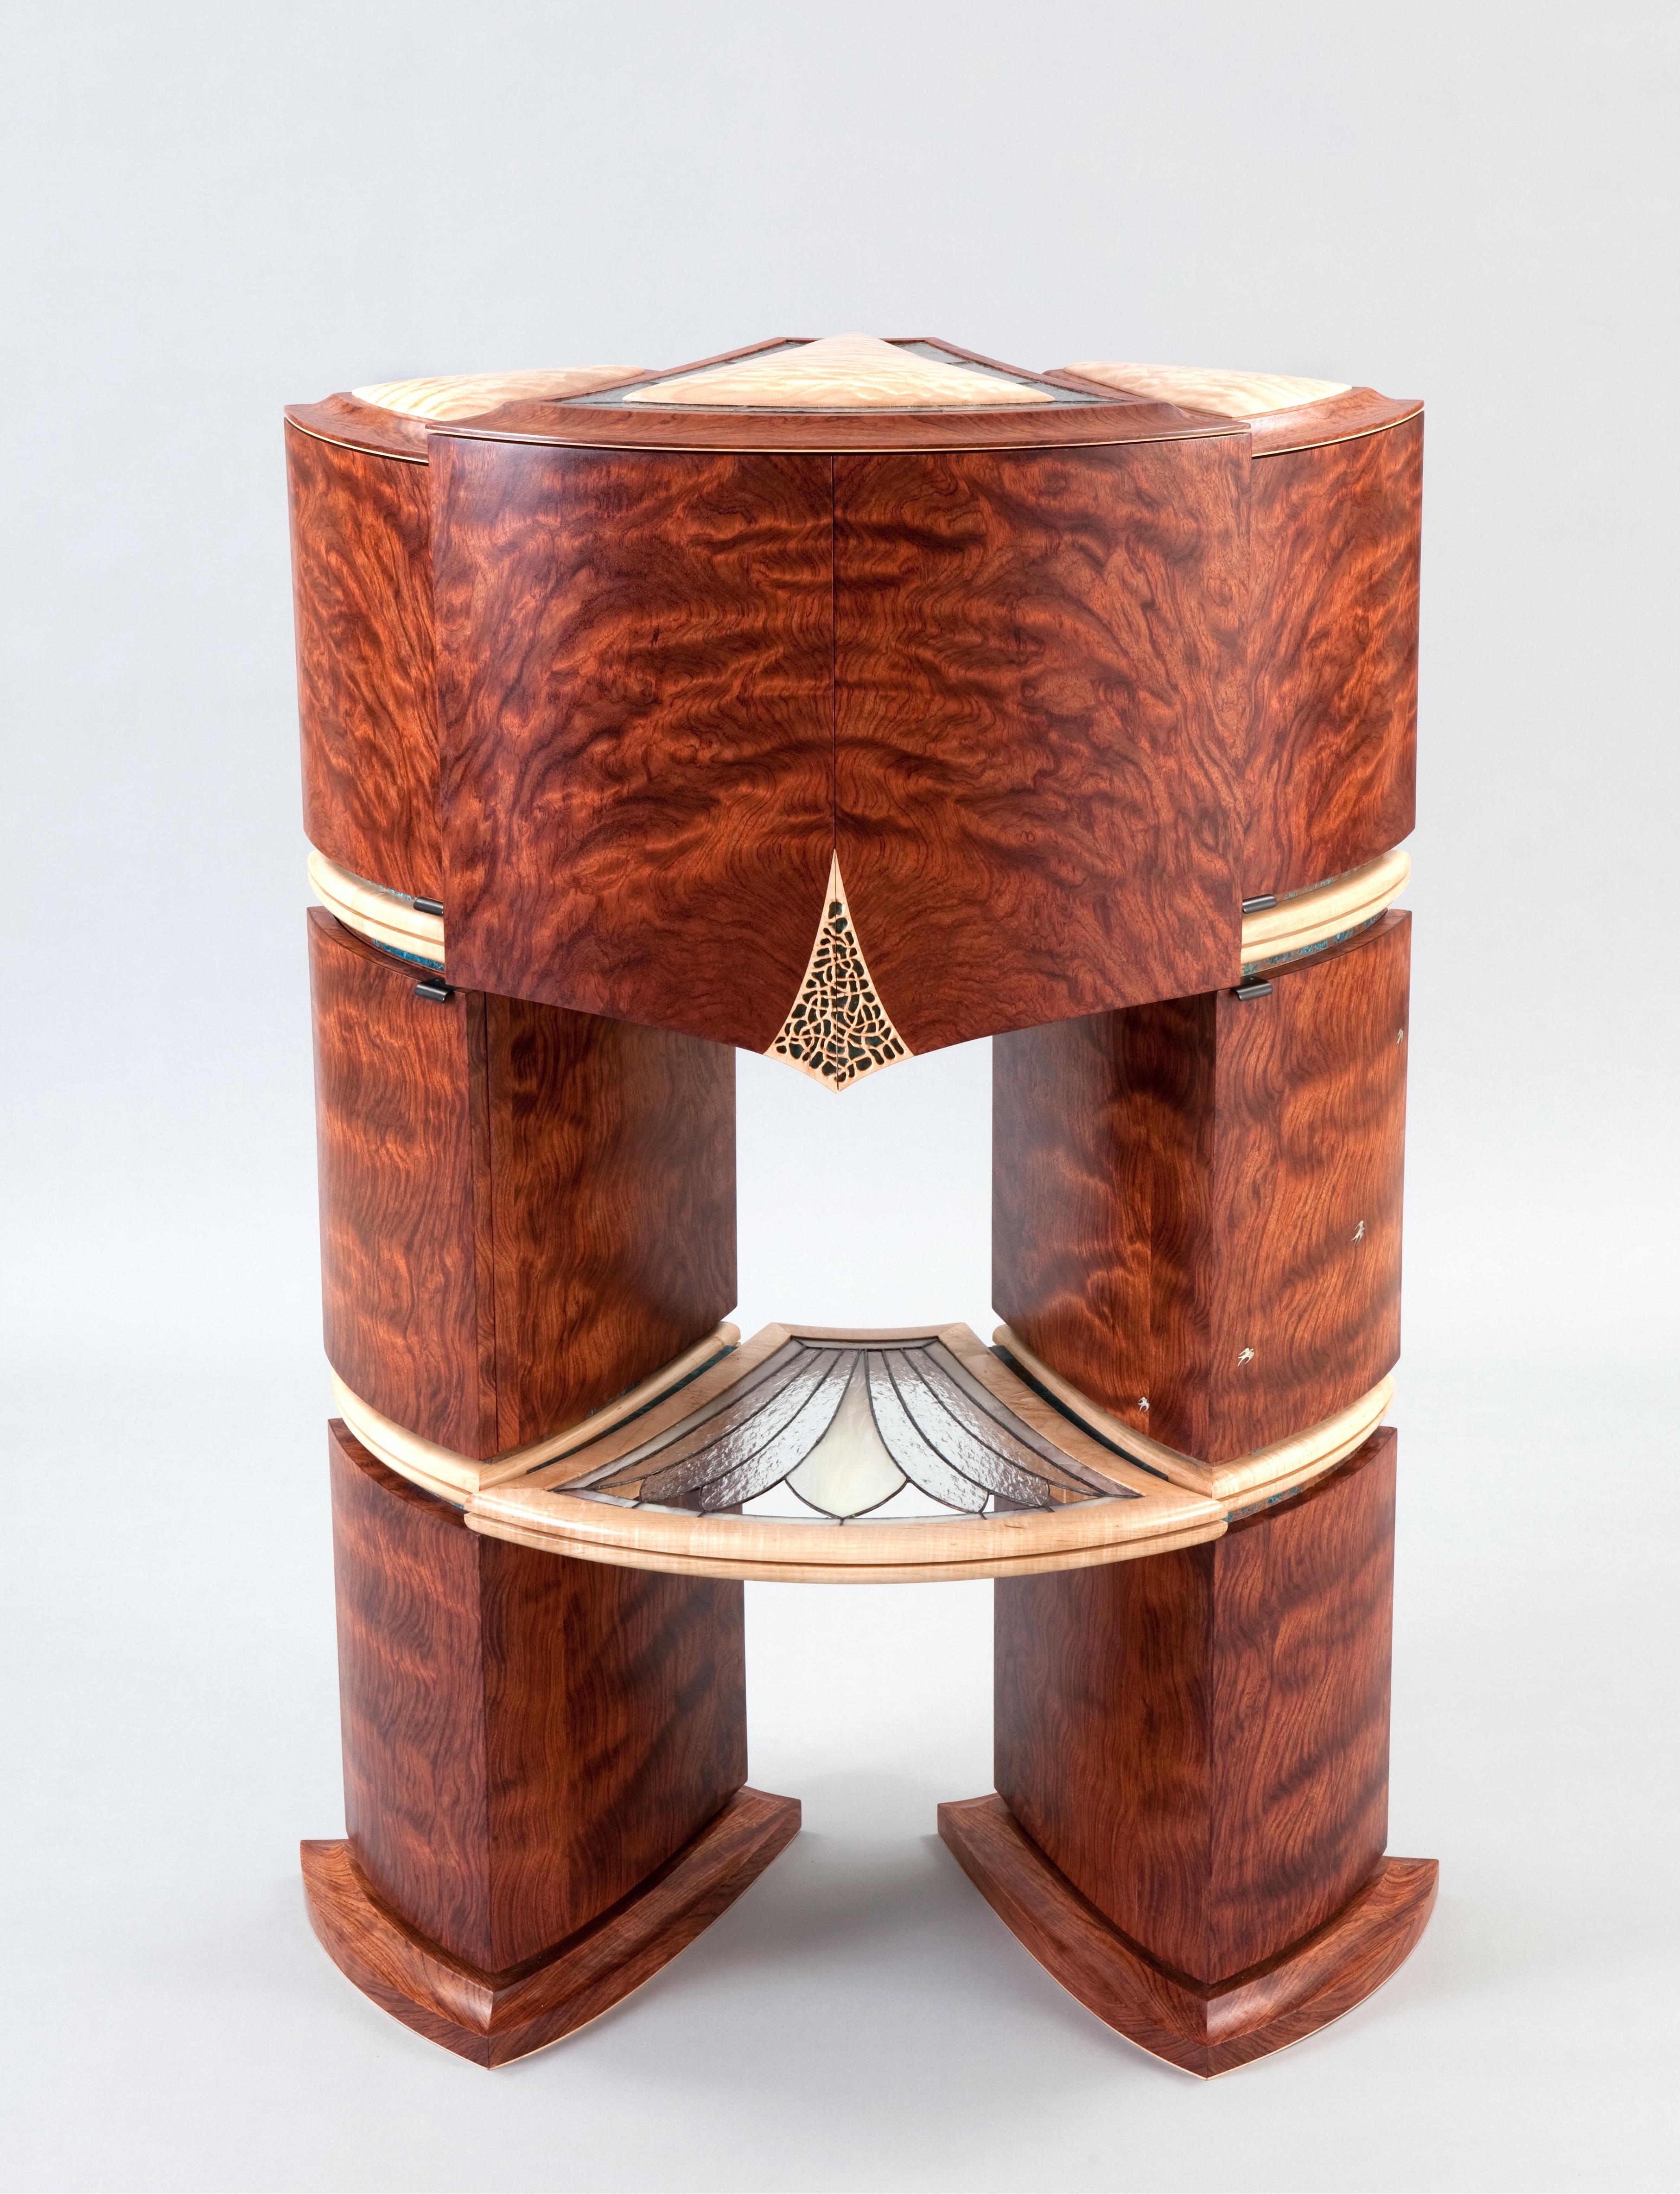 Art of Fine Furniture Mark Laub